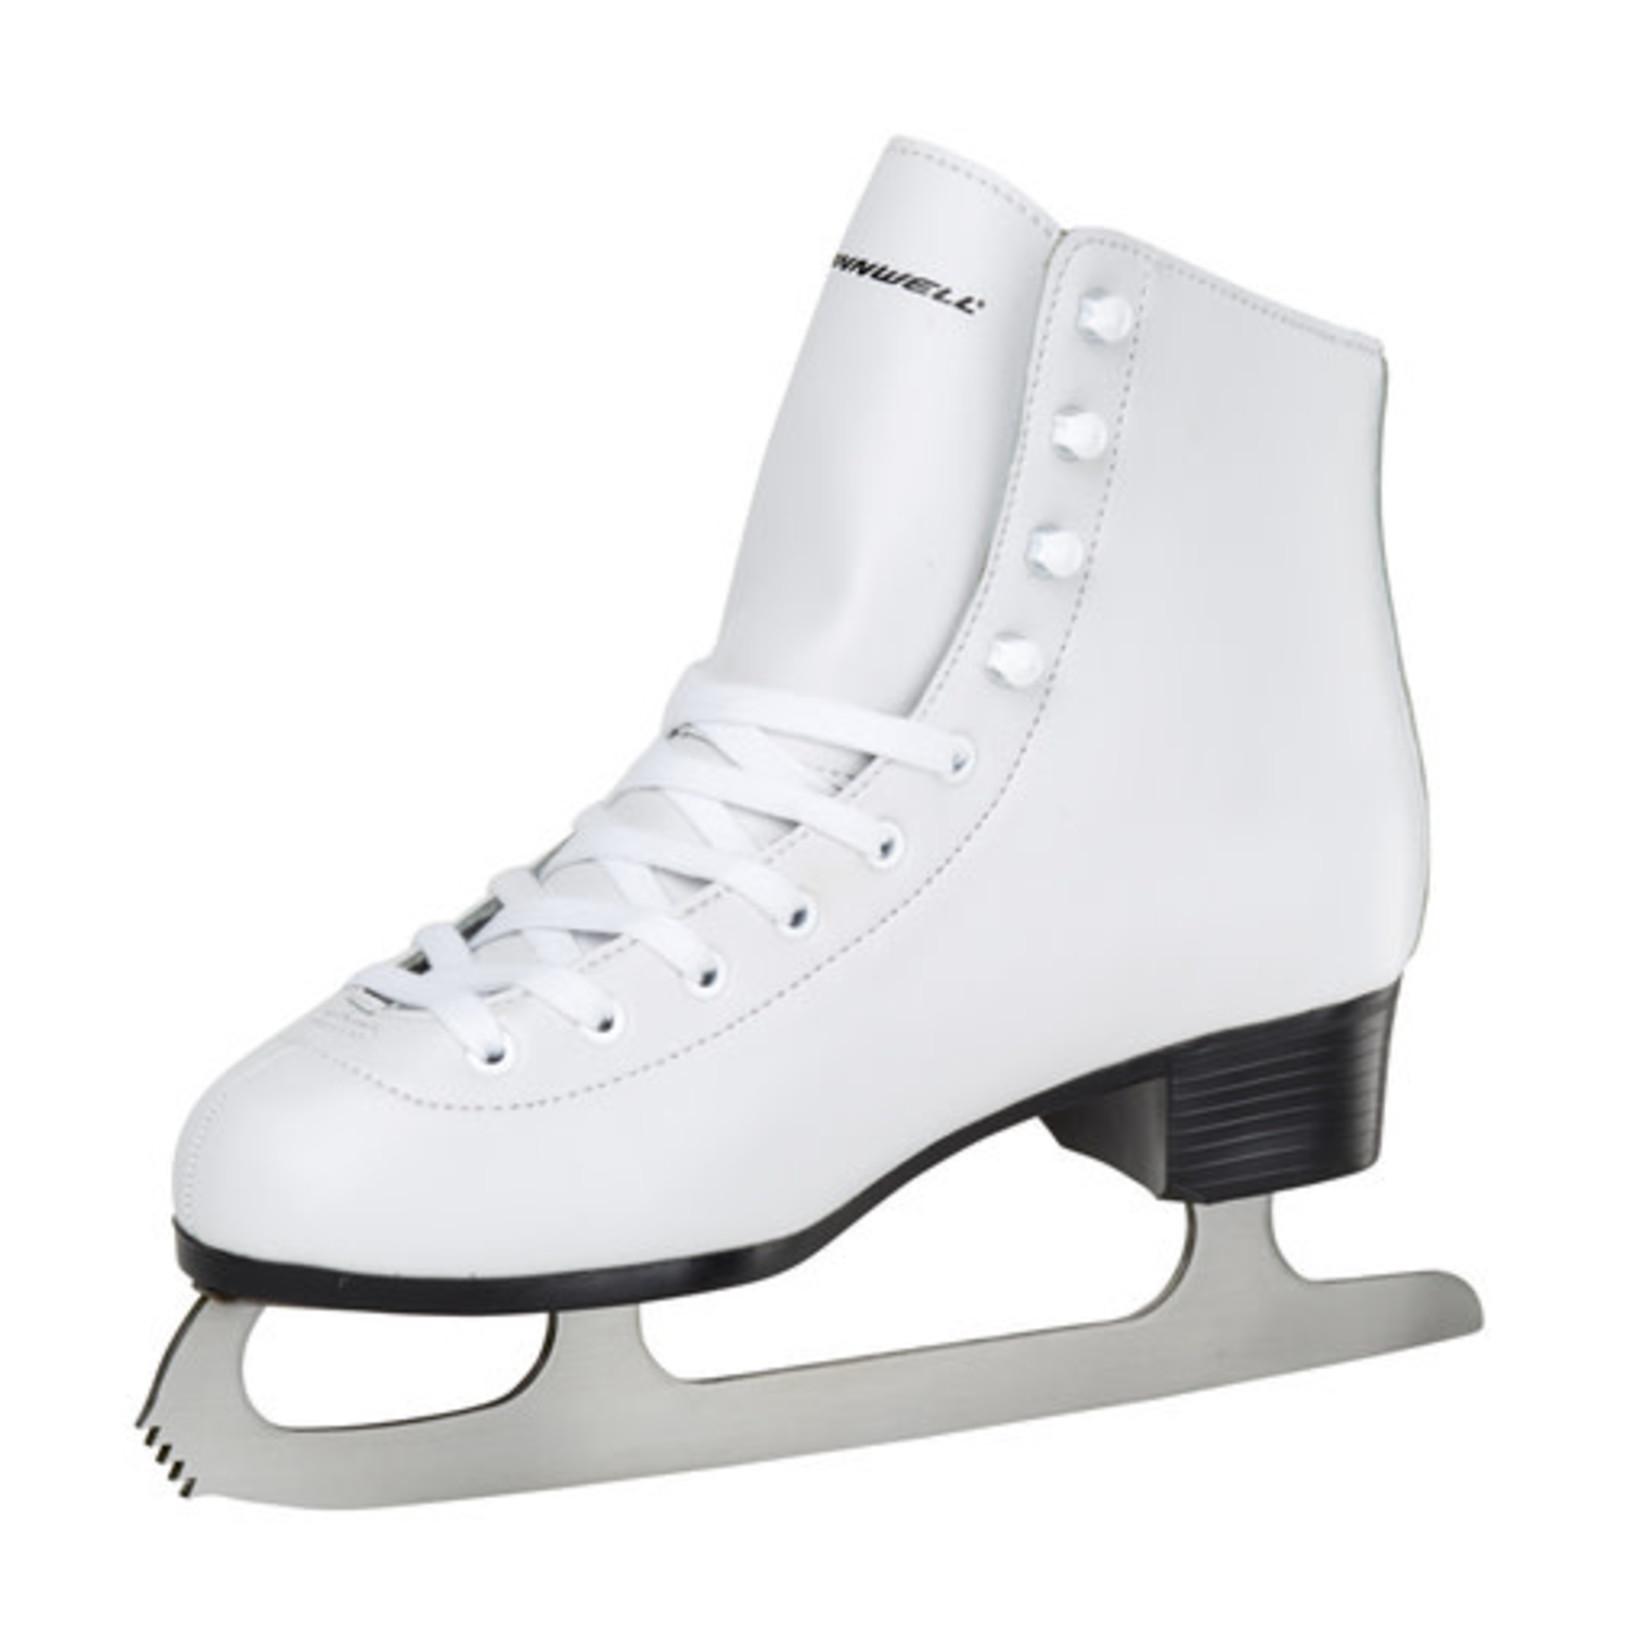 Winnwell Winnwell Figure Skates, SK2001, Tots